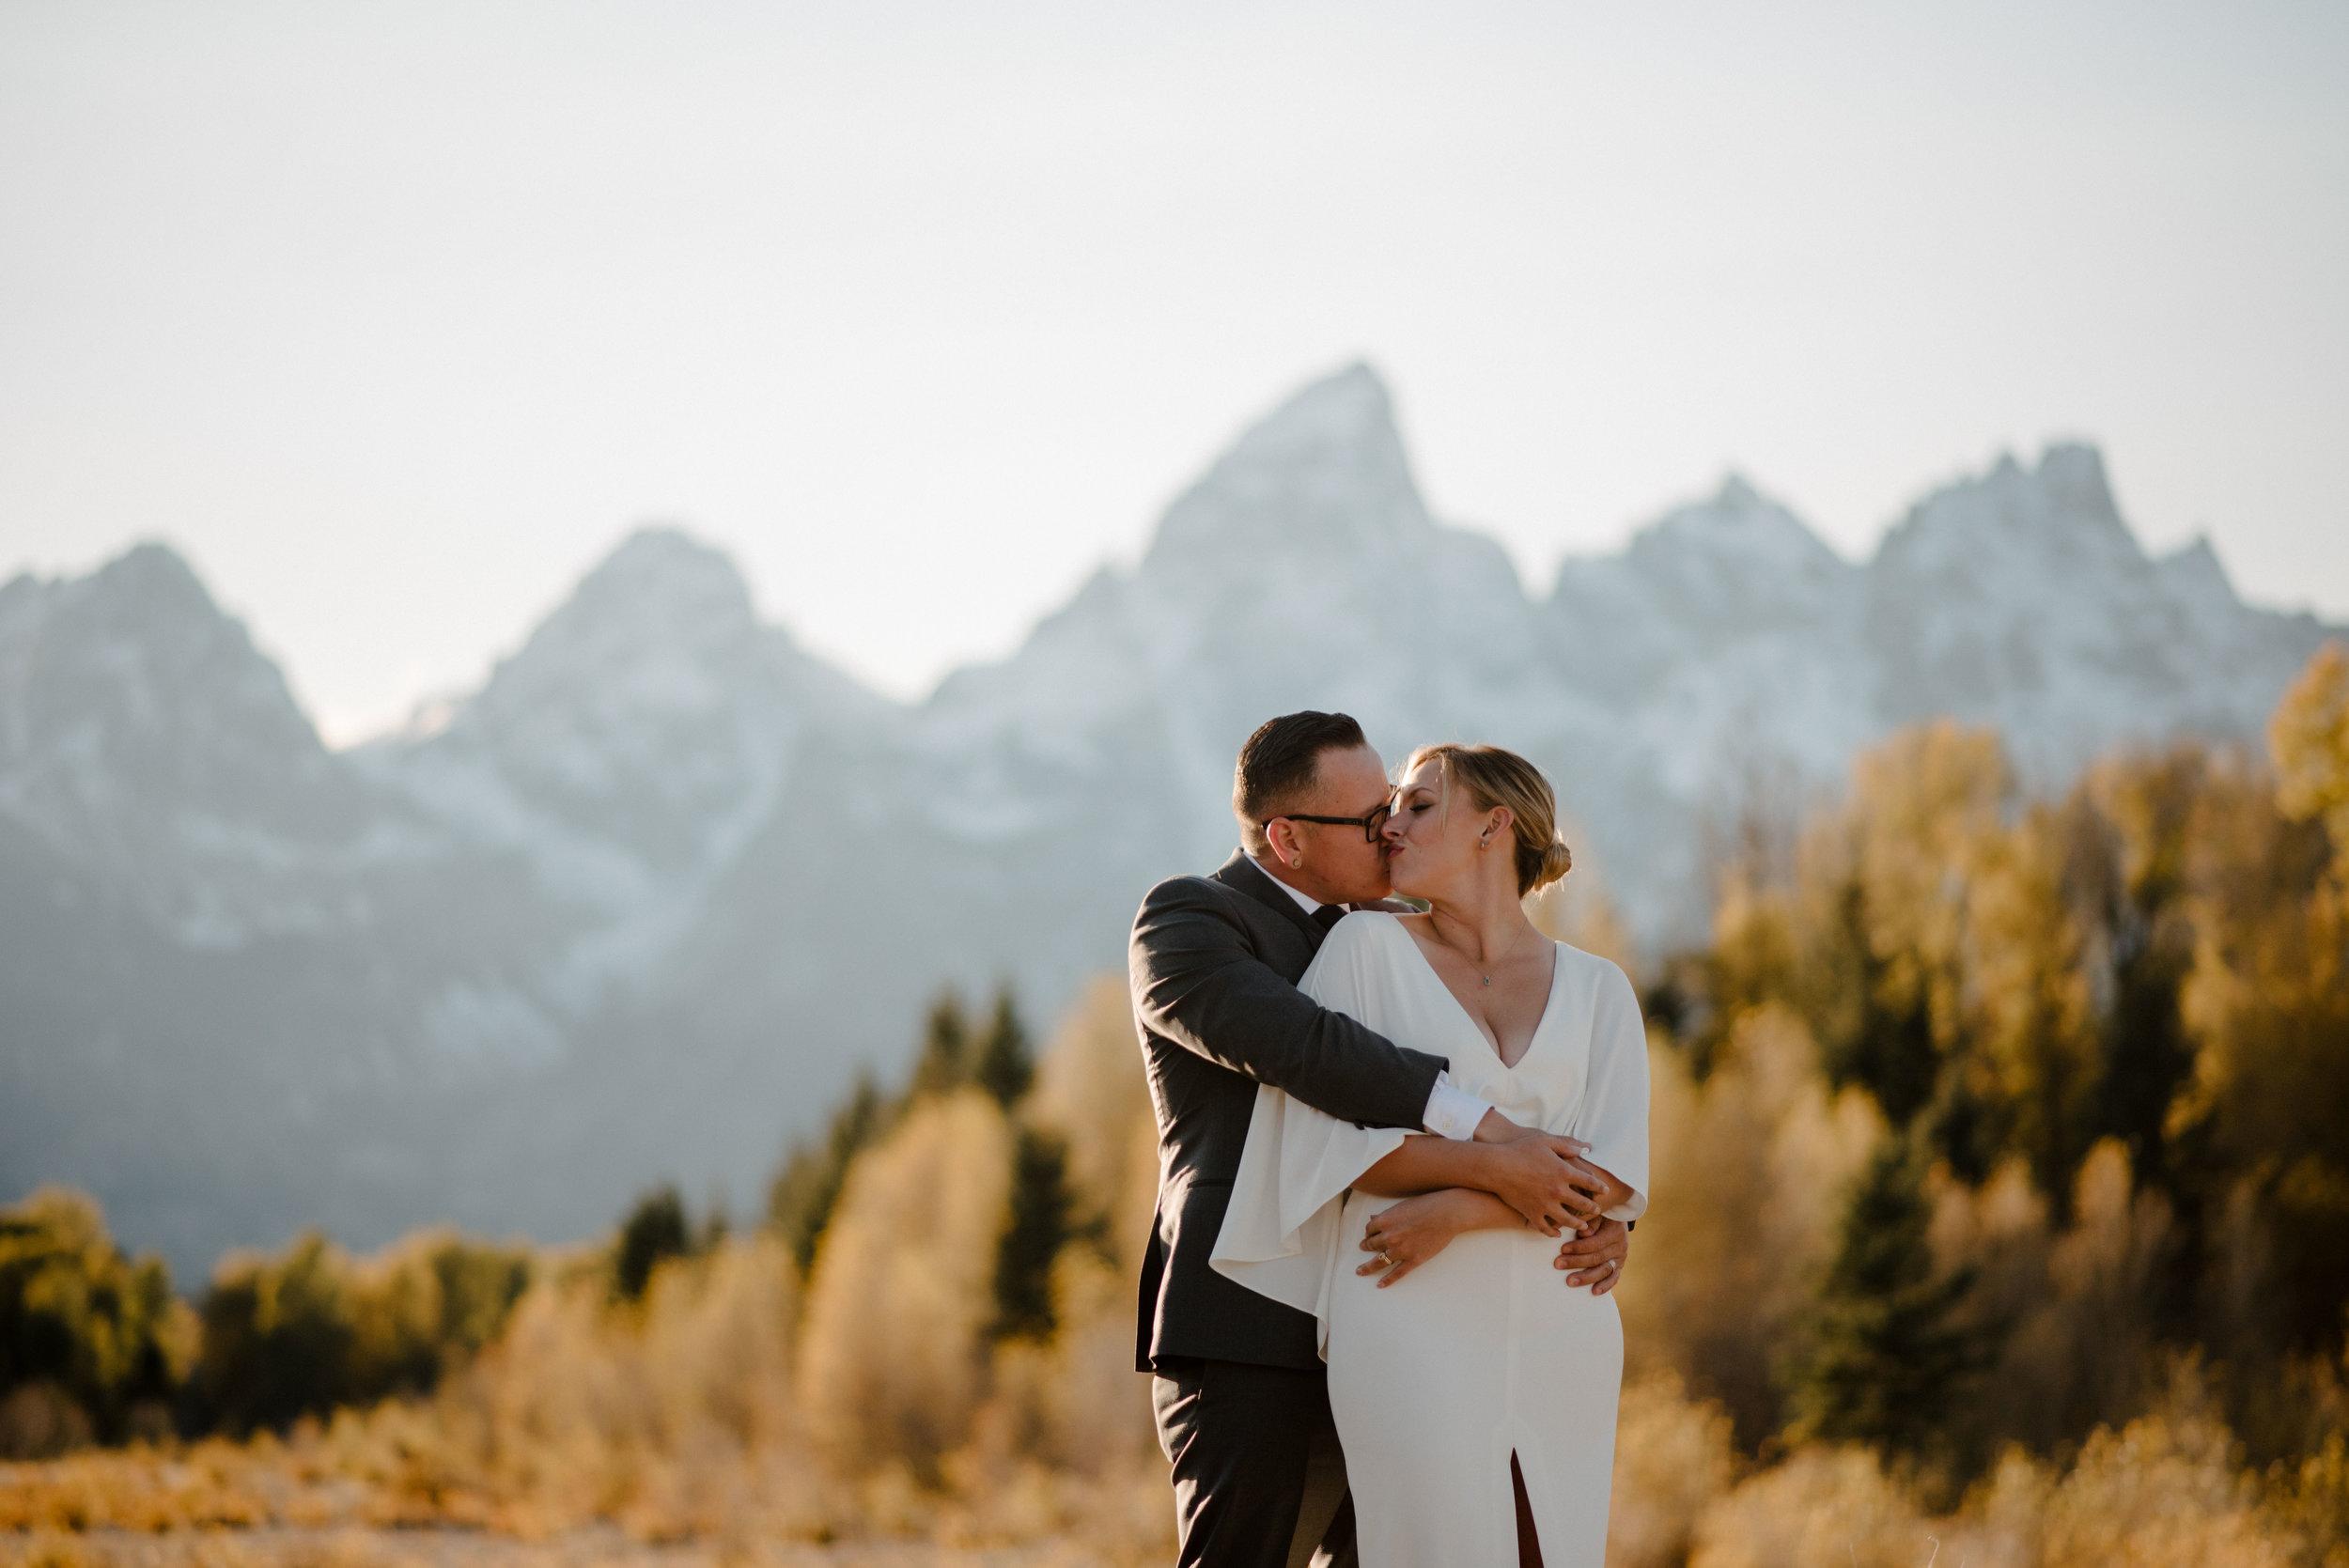 Jackson_Hole_Wedding_Photography_Wyoming_Elopement_Destination_Wedding_Photographer-23.jpg